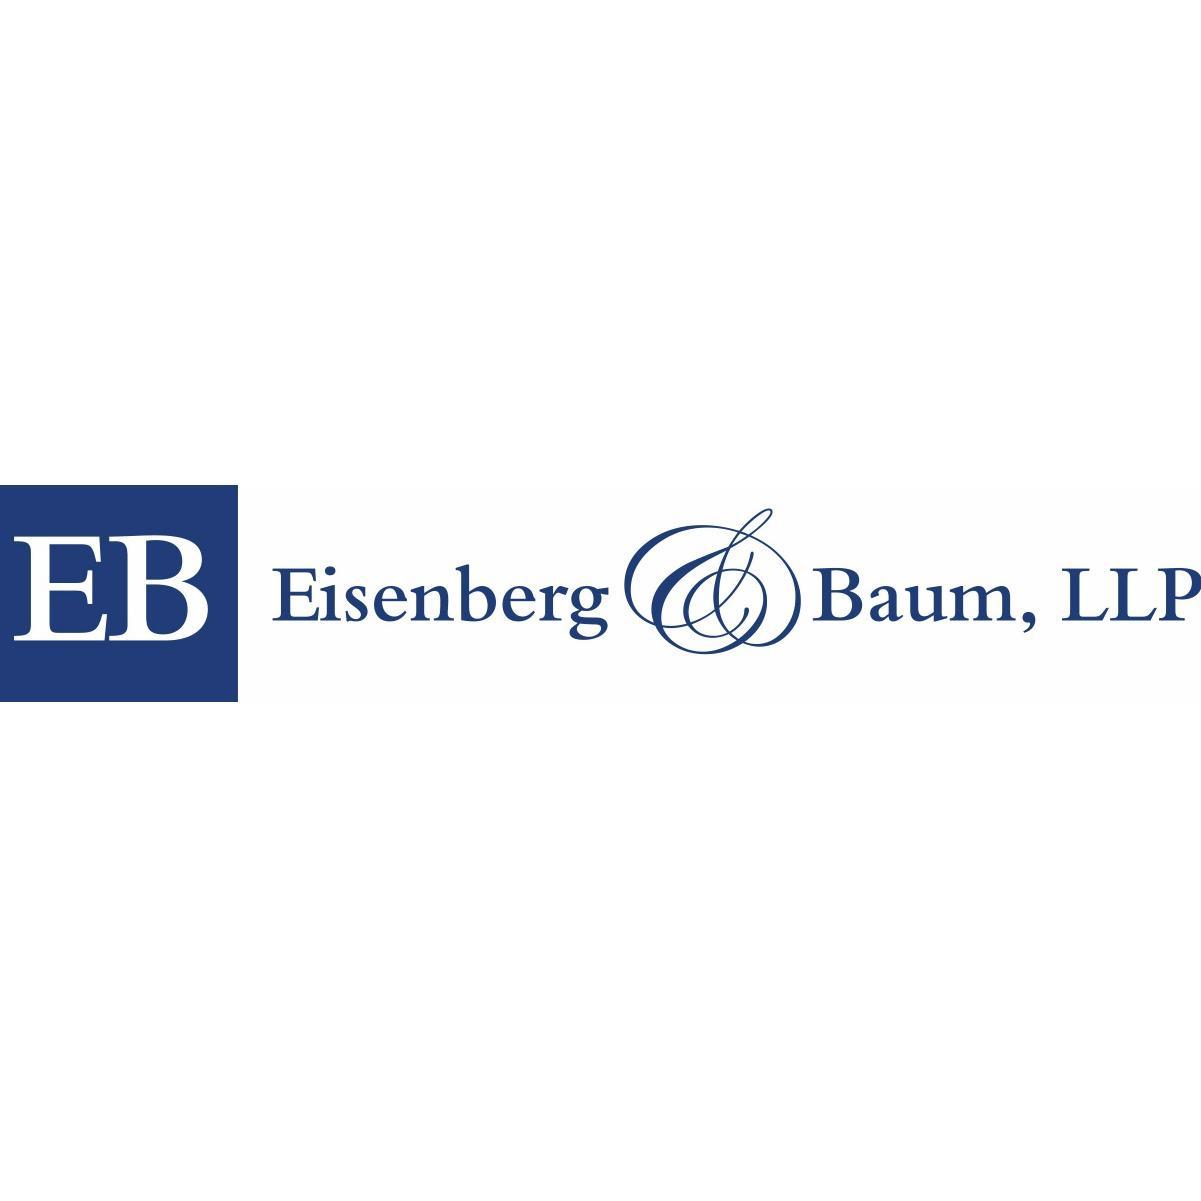 photo of Eisenberg & Baum, LLP